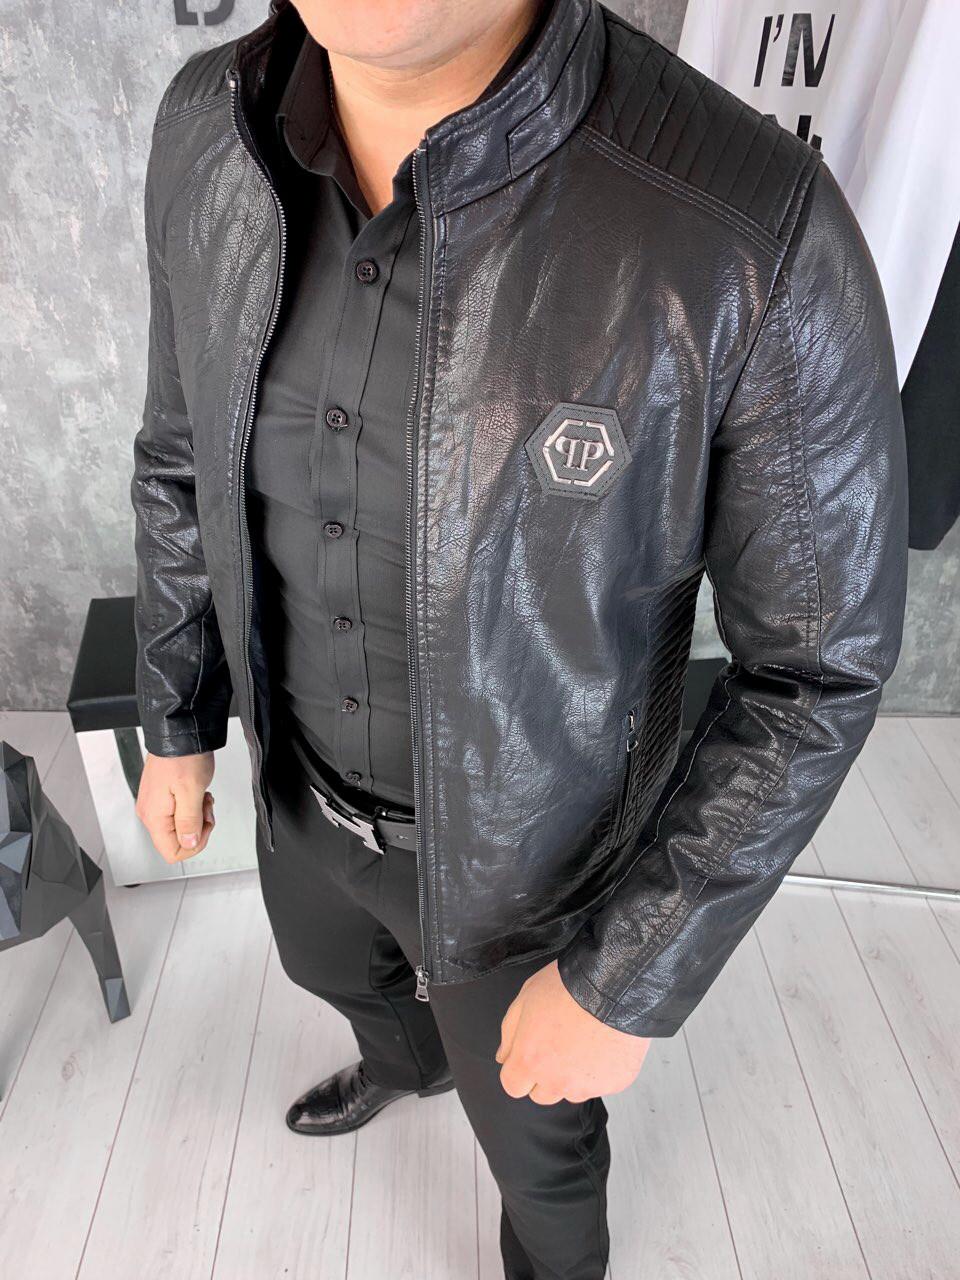 be02b6a4180a Мужская кожаная куртка Philipp plein asket ( Реплика ААА+) - купить ...